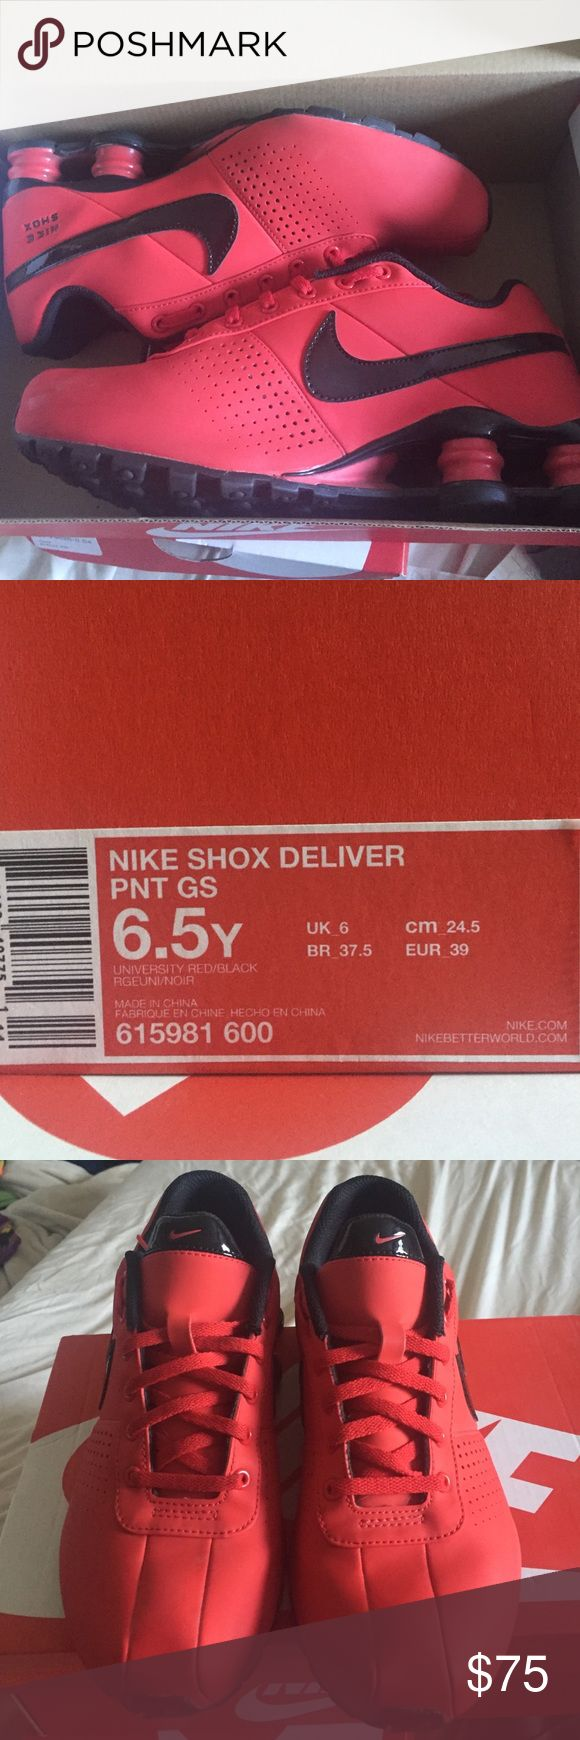 Red & black Nike shox Red & black Nike shox. Barely worn, great shape. Nike Shoes Sneakers